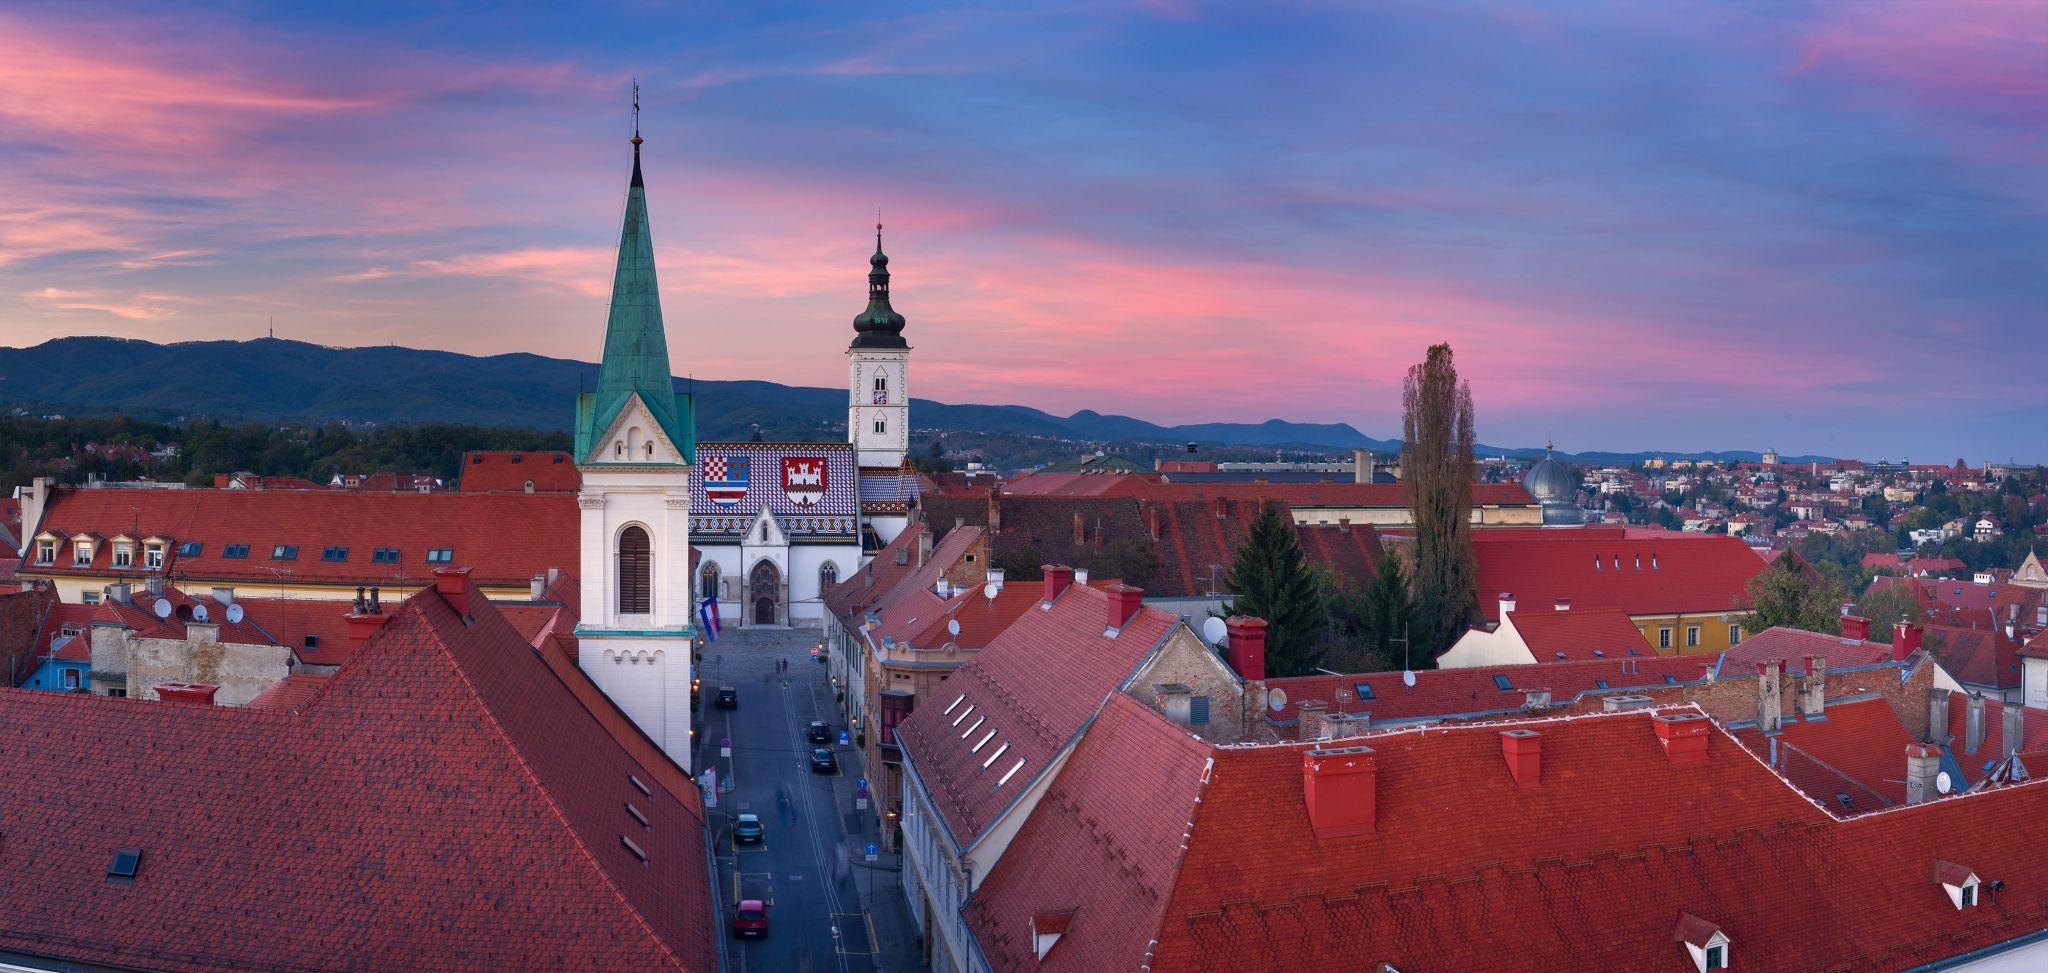 Looking on St. Marks church, Croatia